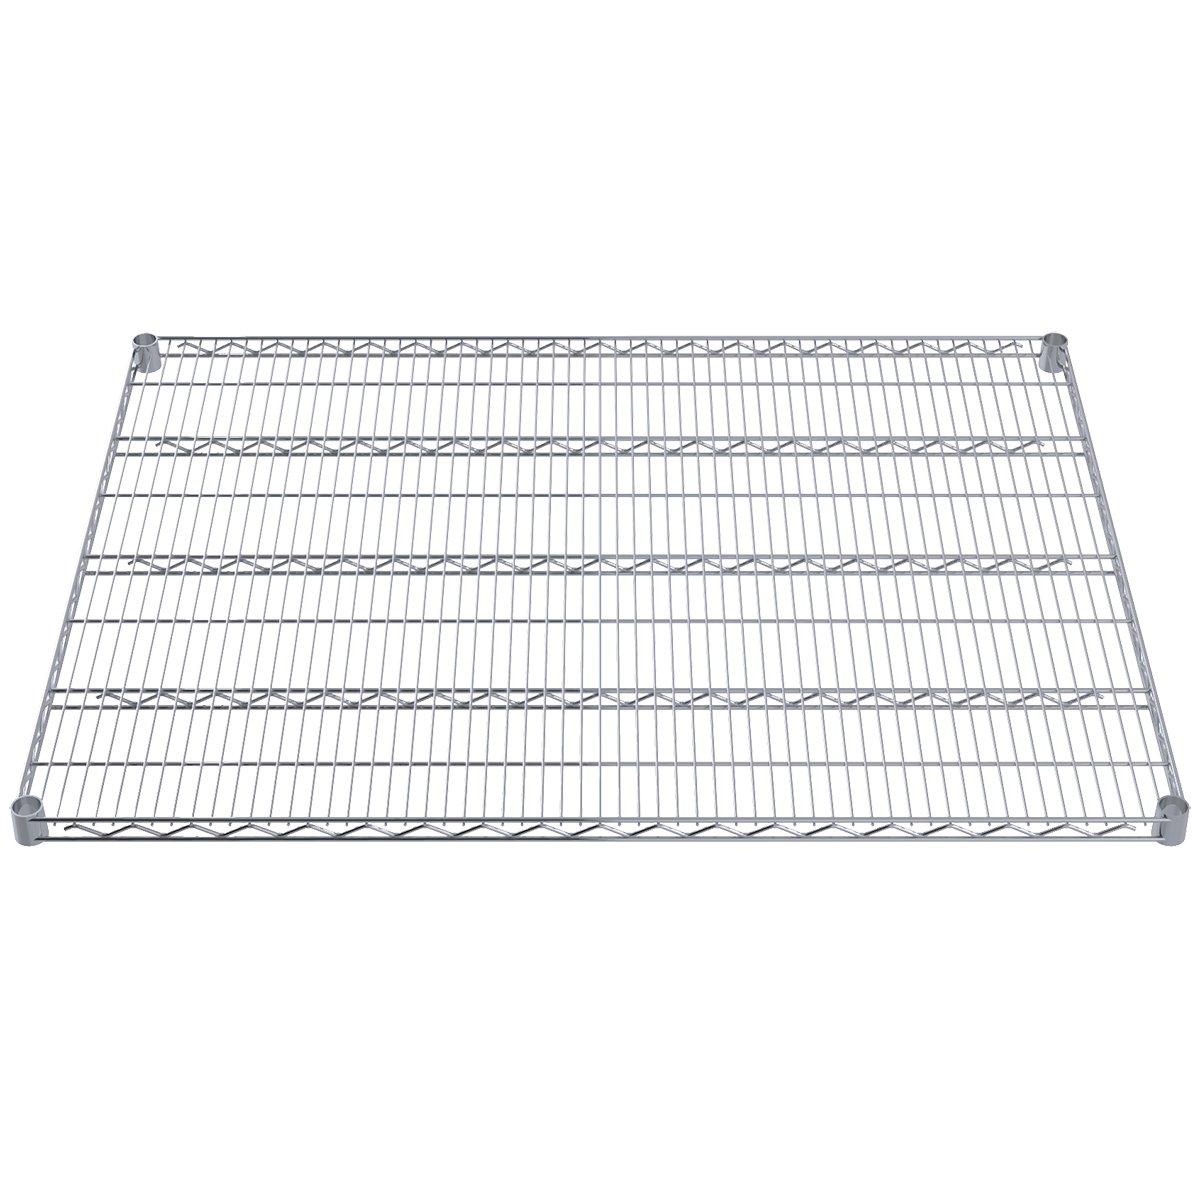 Akro-Mils AWS3648SHELF 36-Inch X 48-Inch NSF Approved Industrial Grade Chrome Wire Shelf, 2-Pack